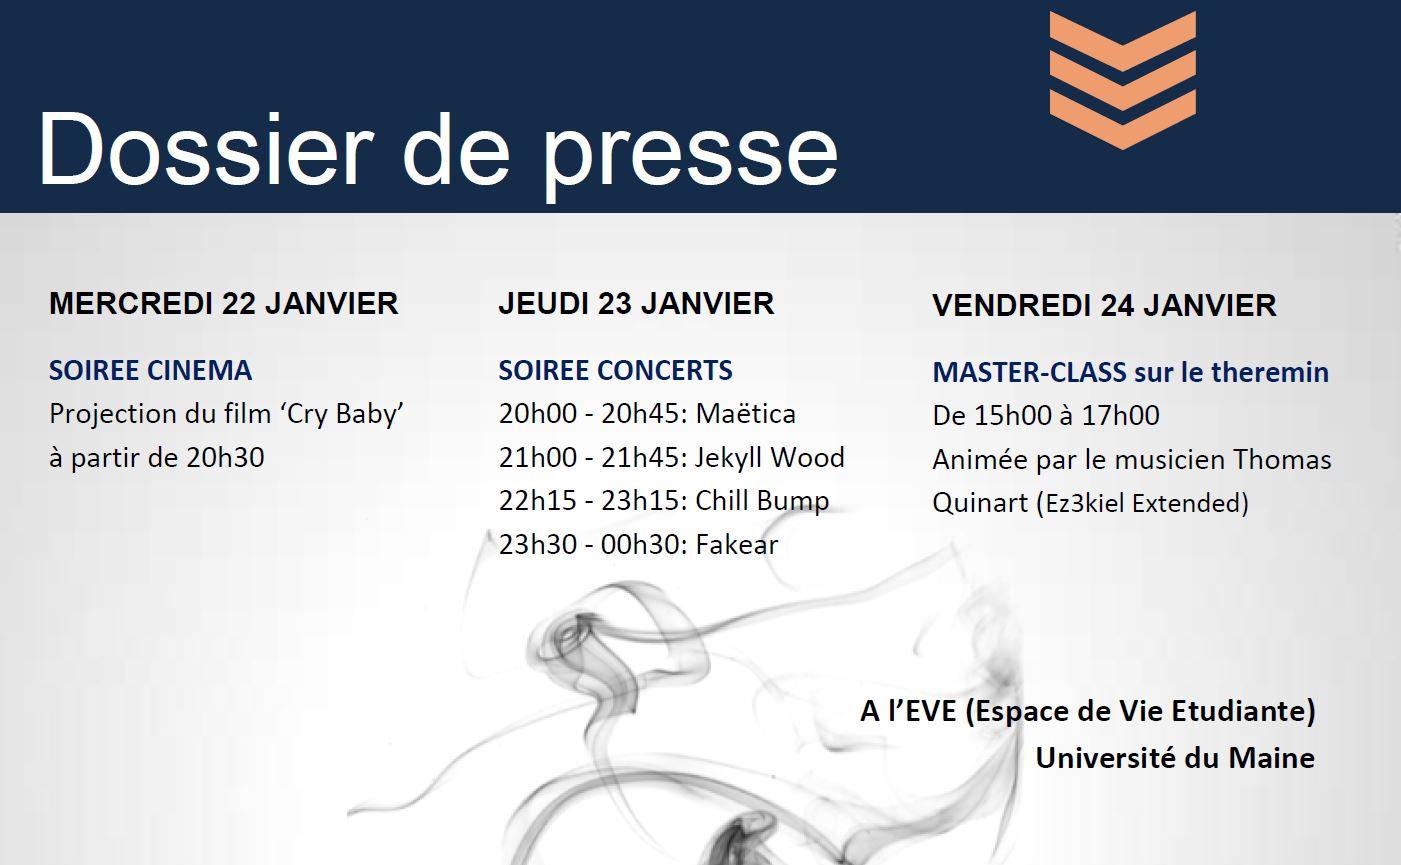 Dossier de presse – Festival Electrik Campus 2014